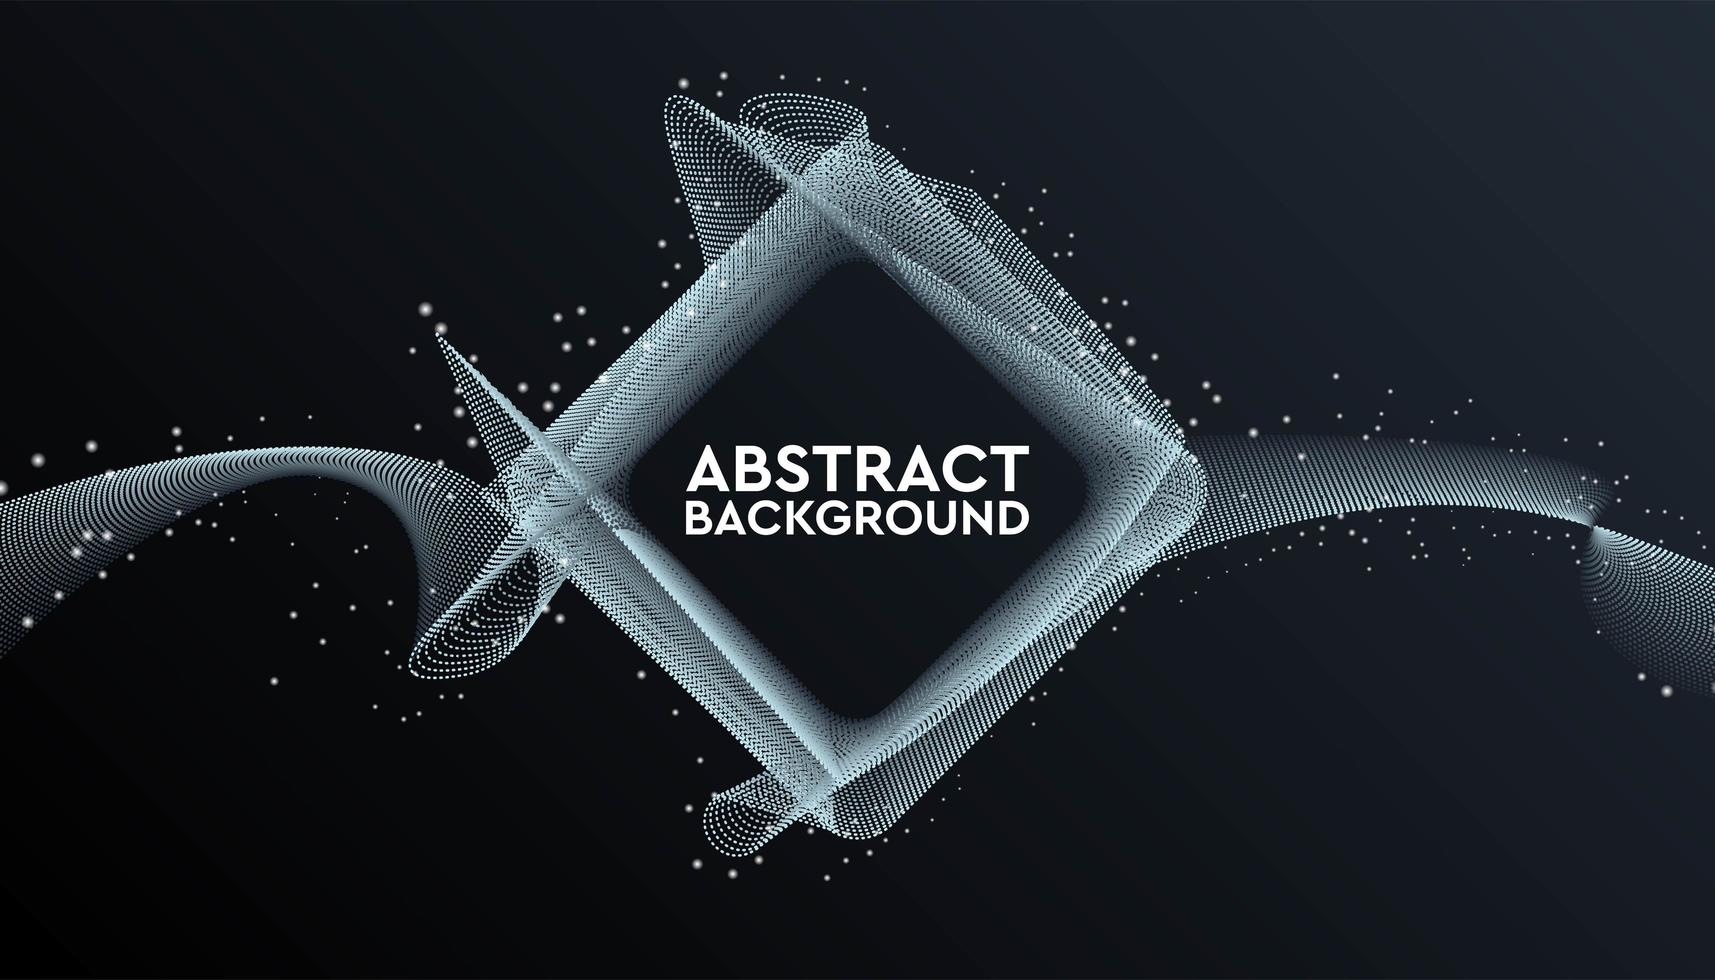 banner quadrado geométrico abstrato preto e cinza vetor